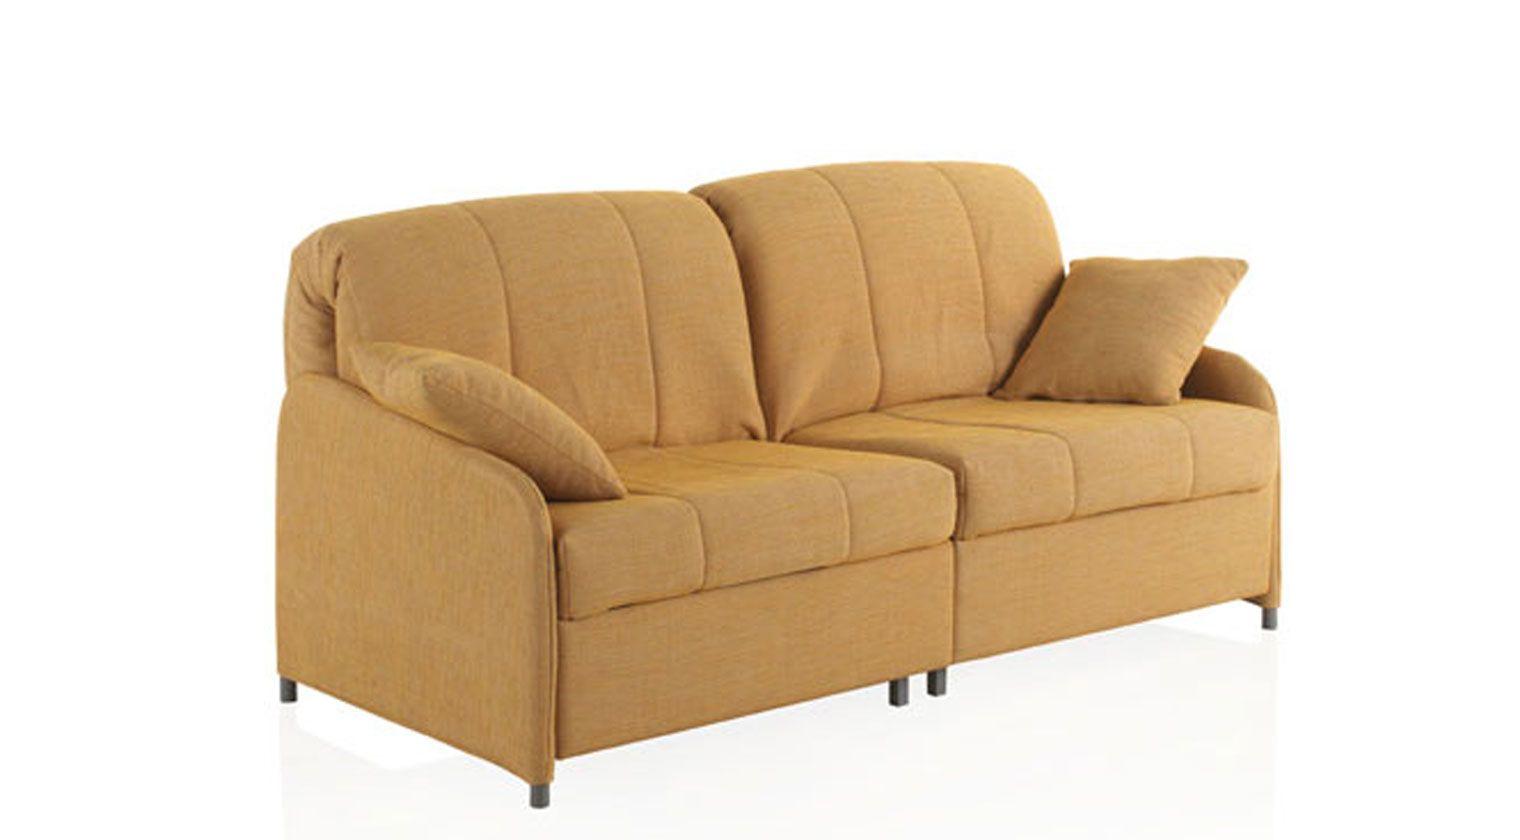 Comprar sof cama dijon 1 plaza cama de 90x190 cm buzo for Sofa cama nido 1 plaza